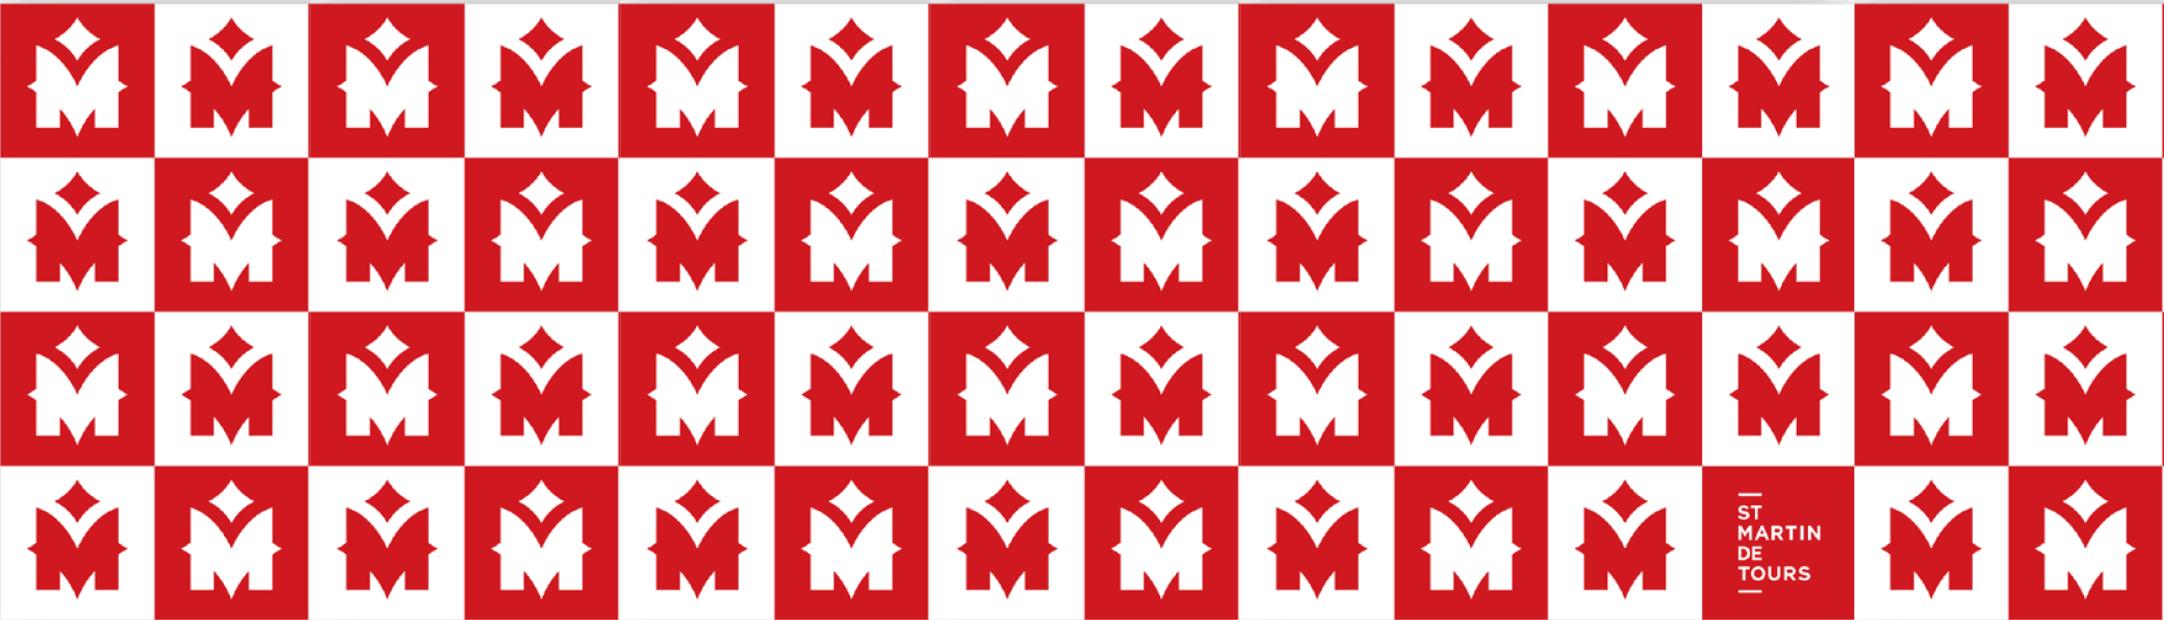 Motif St Martin Vikiu Design